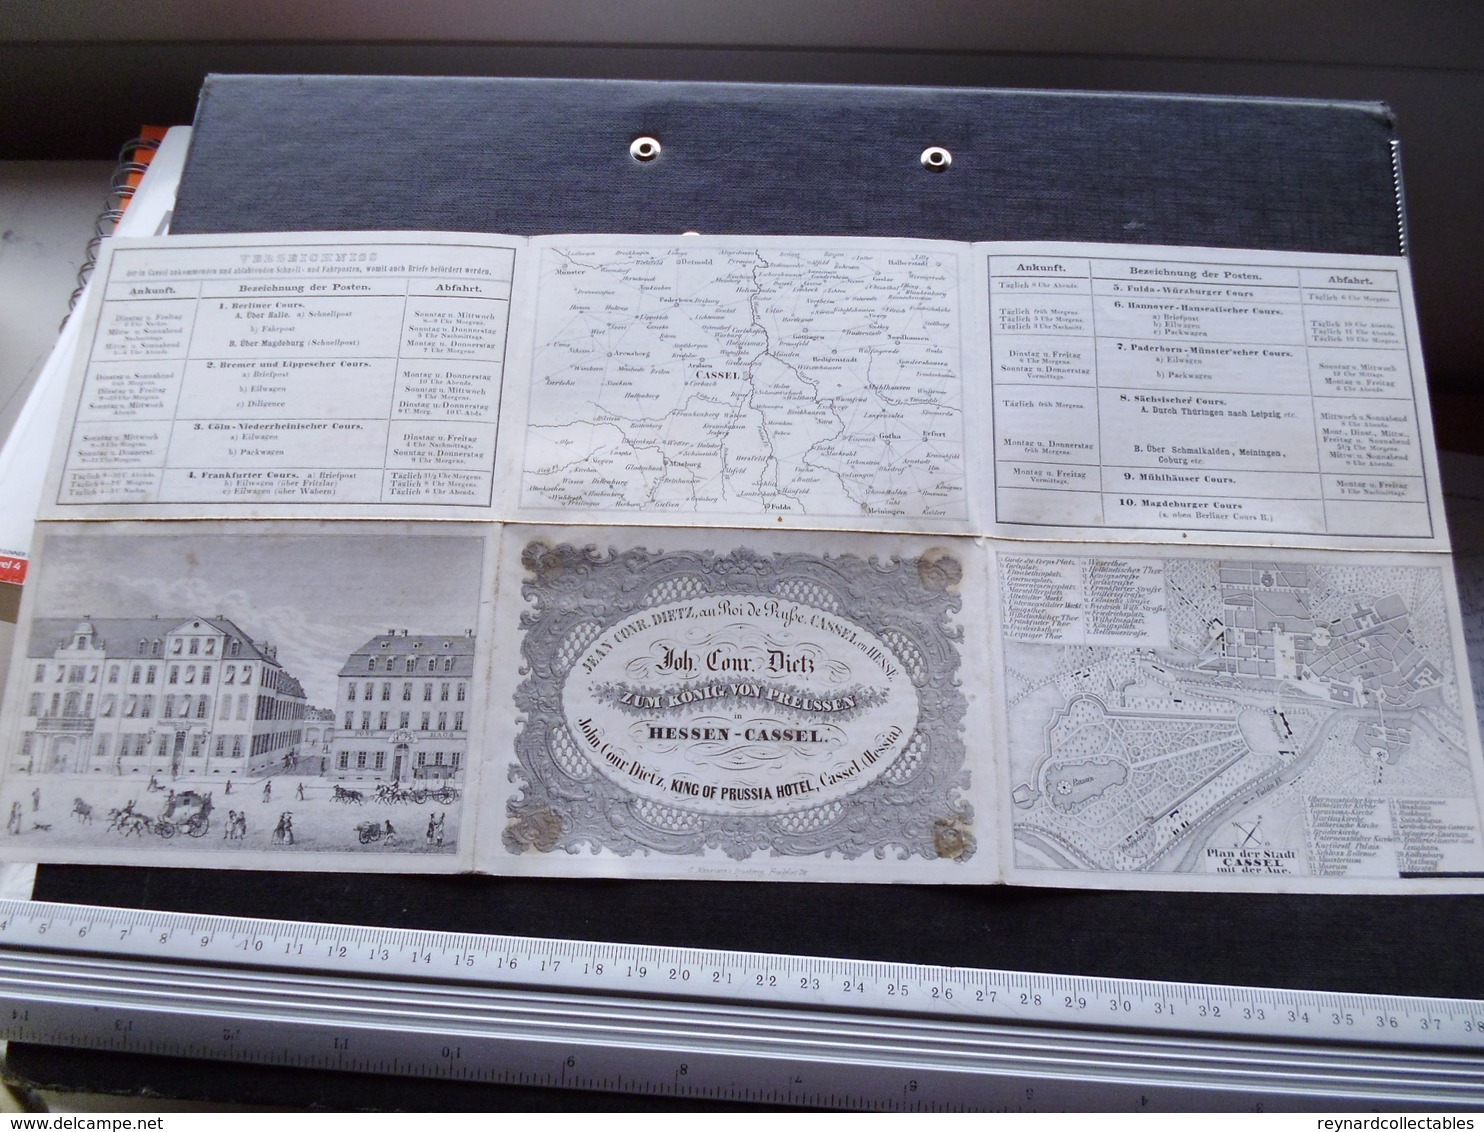 19thC Hotel Konig Von Preussen, Hessen-Cassel, Advertising Fold Out.Map Of Cassel.Post Routes++ - Advertising